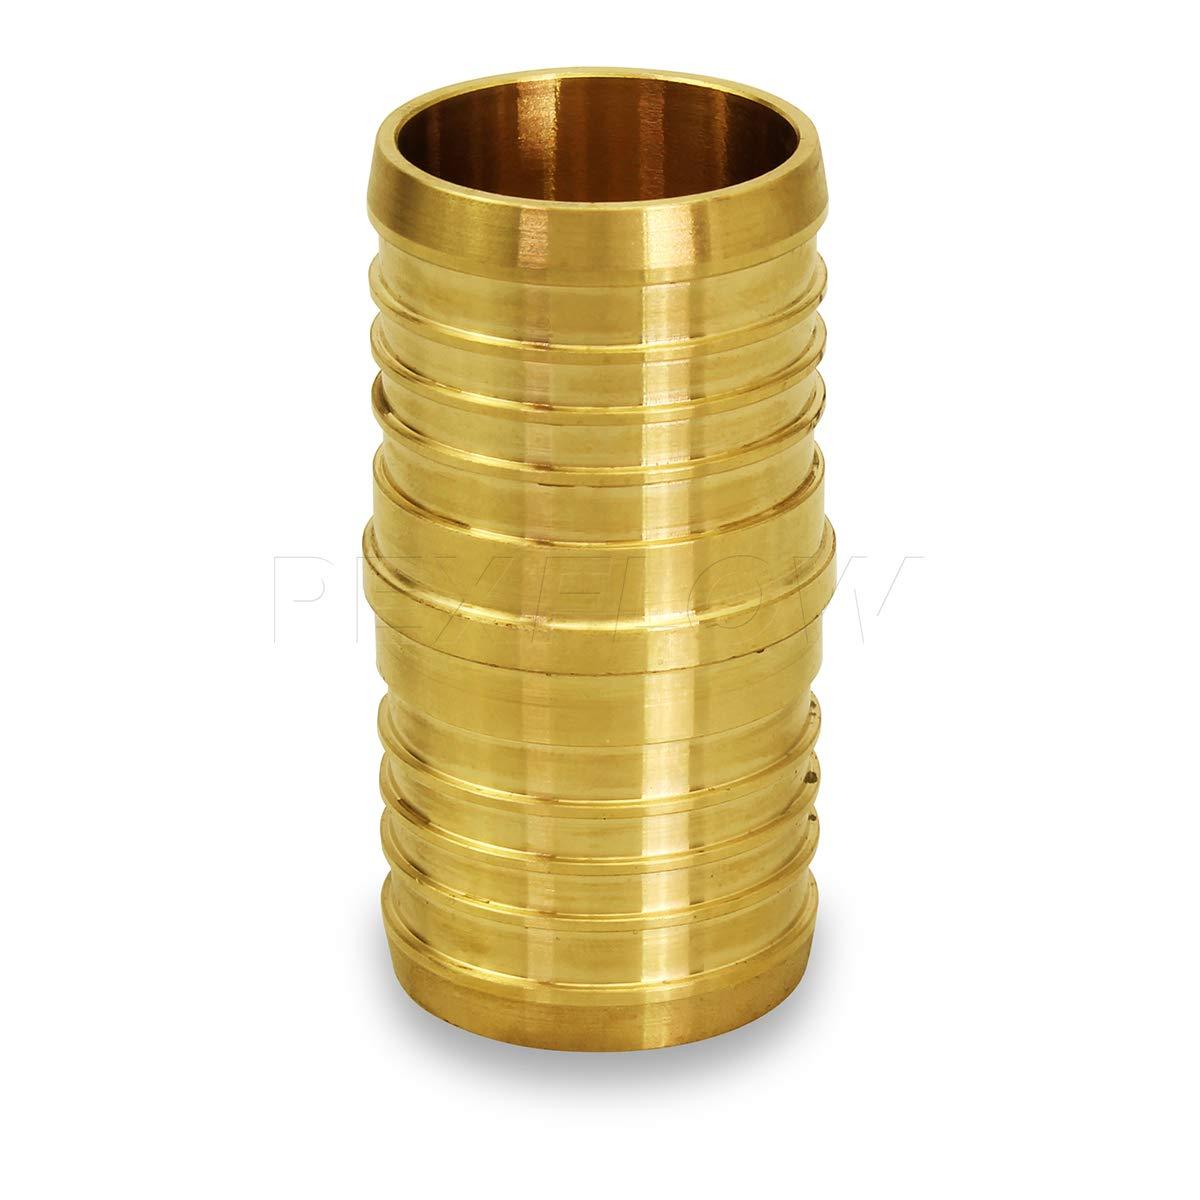 Brass 3//8 Pexflow EPCP0038-NL PEX X PEX Straight Coupling Barb Pipe Fitting